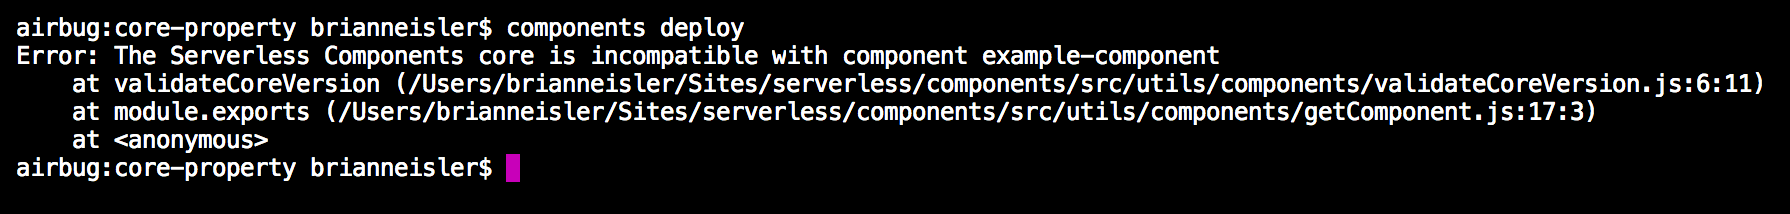 core version locking error